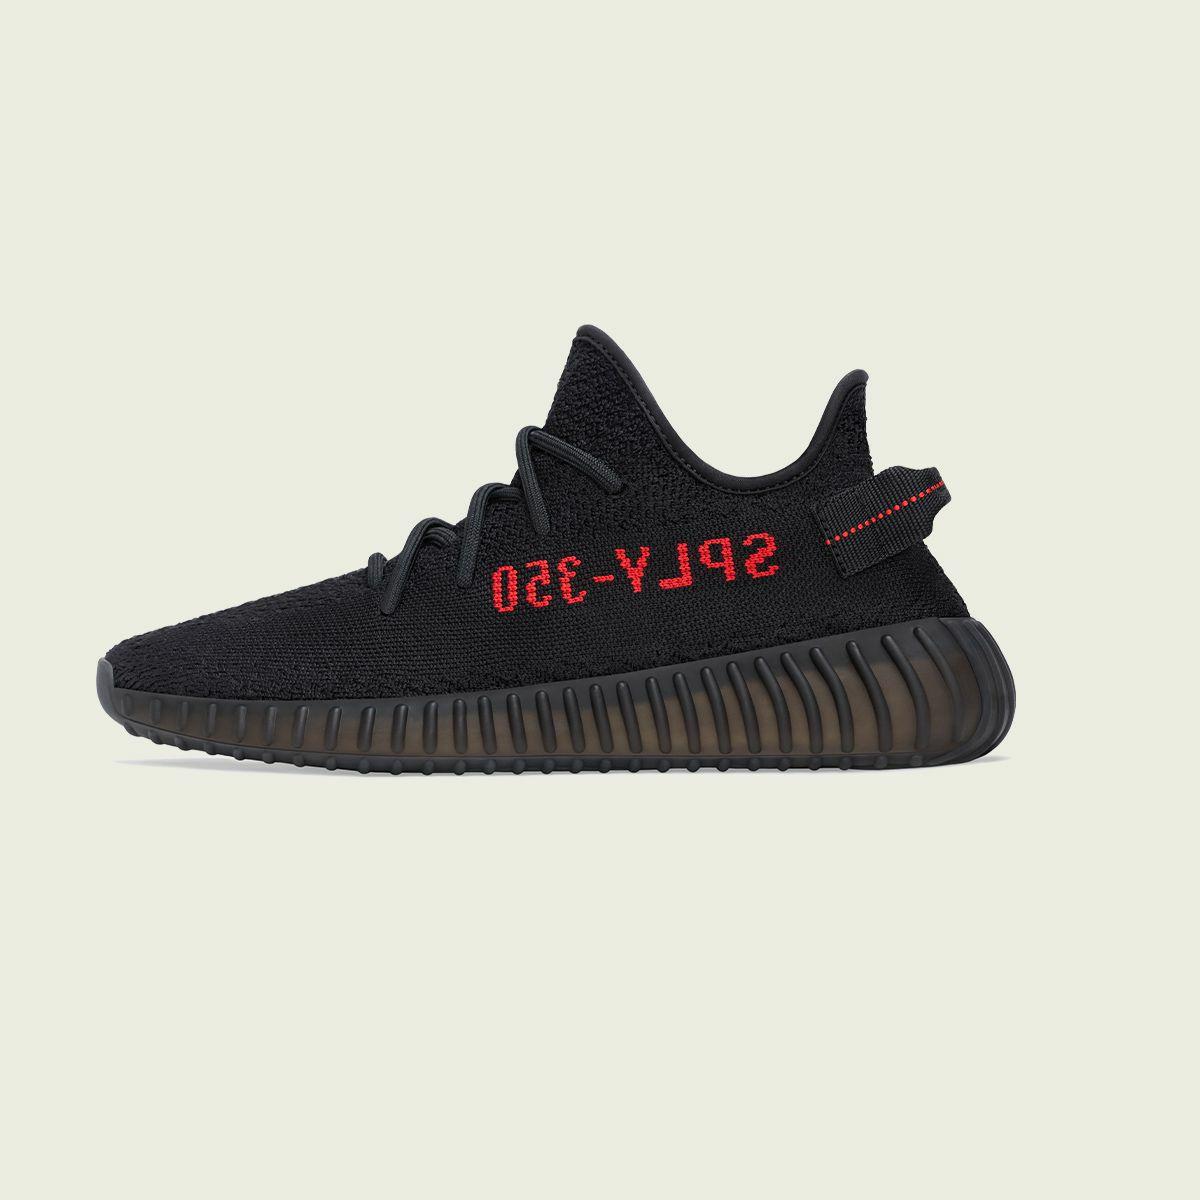 adidas YEEZY BOOST 350 V2 CORE BLACK